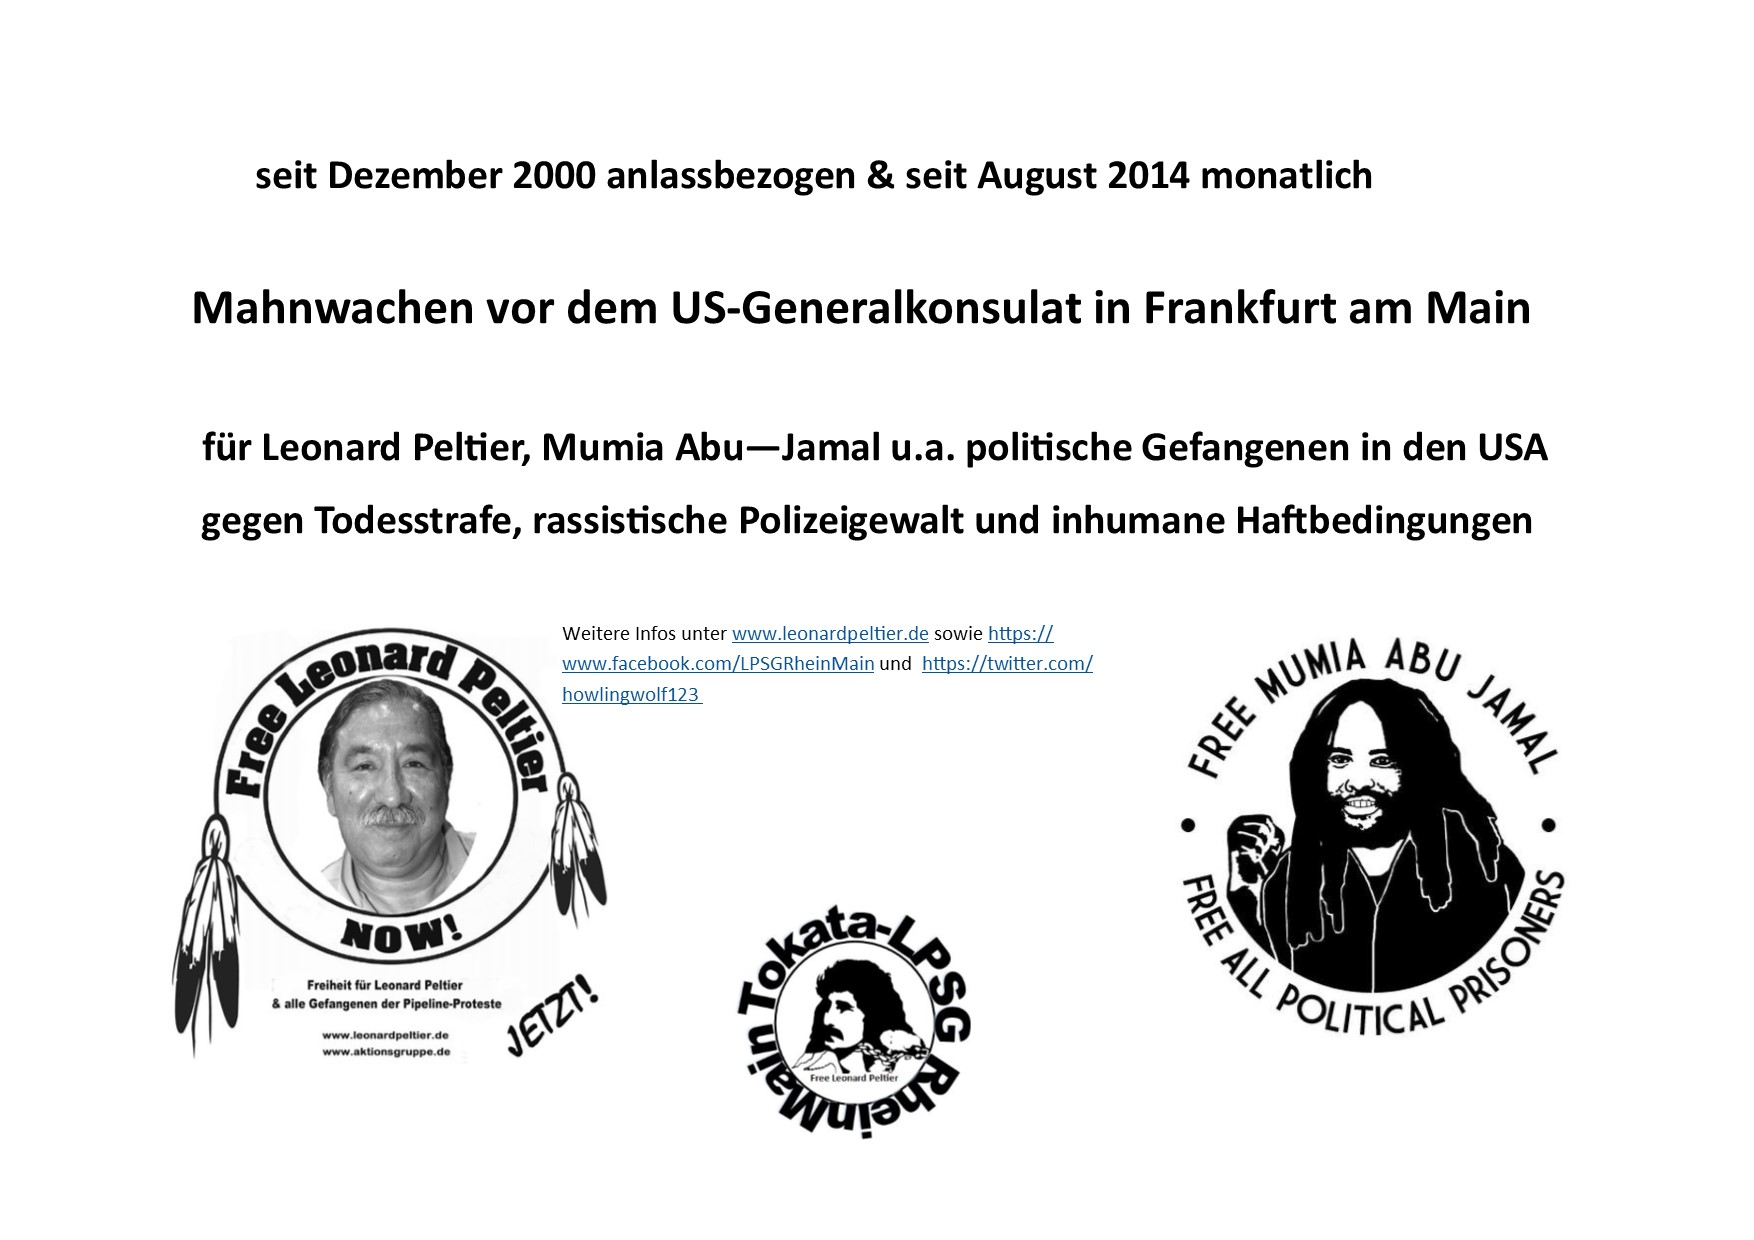 Mahnwache für Leonard Peltier, Mumia Abu-Jamal u.a. politische Langzeitgefangene in den USA in Frankfurt am Main